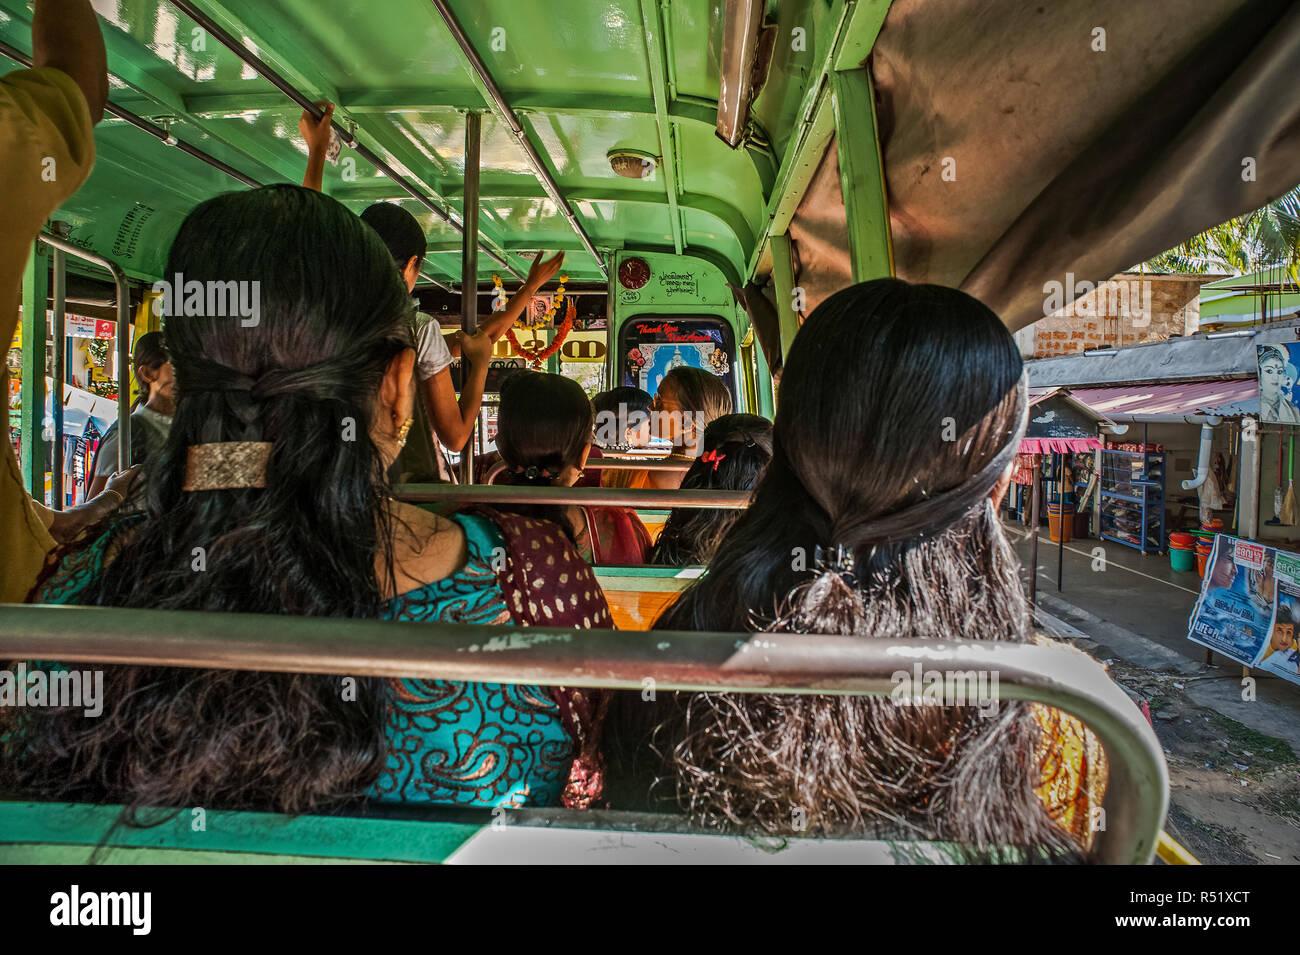 26 Jan 2013 Kerala Womana S Hair Style Woman Sitting In Bus